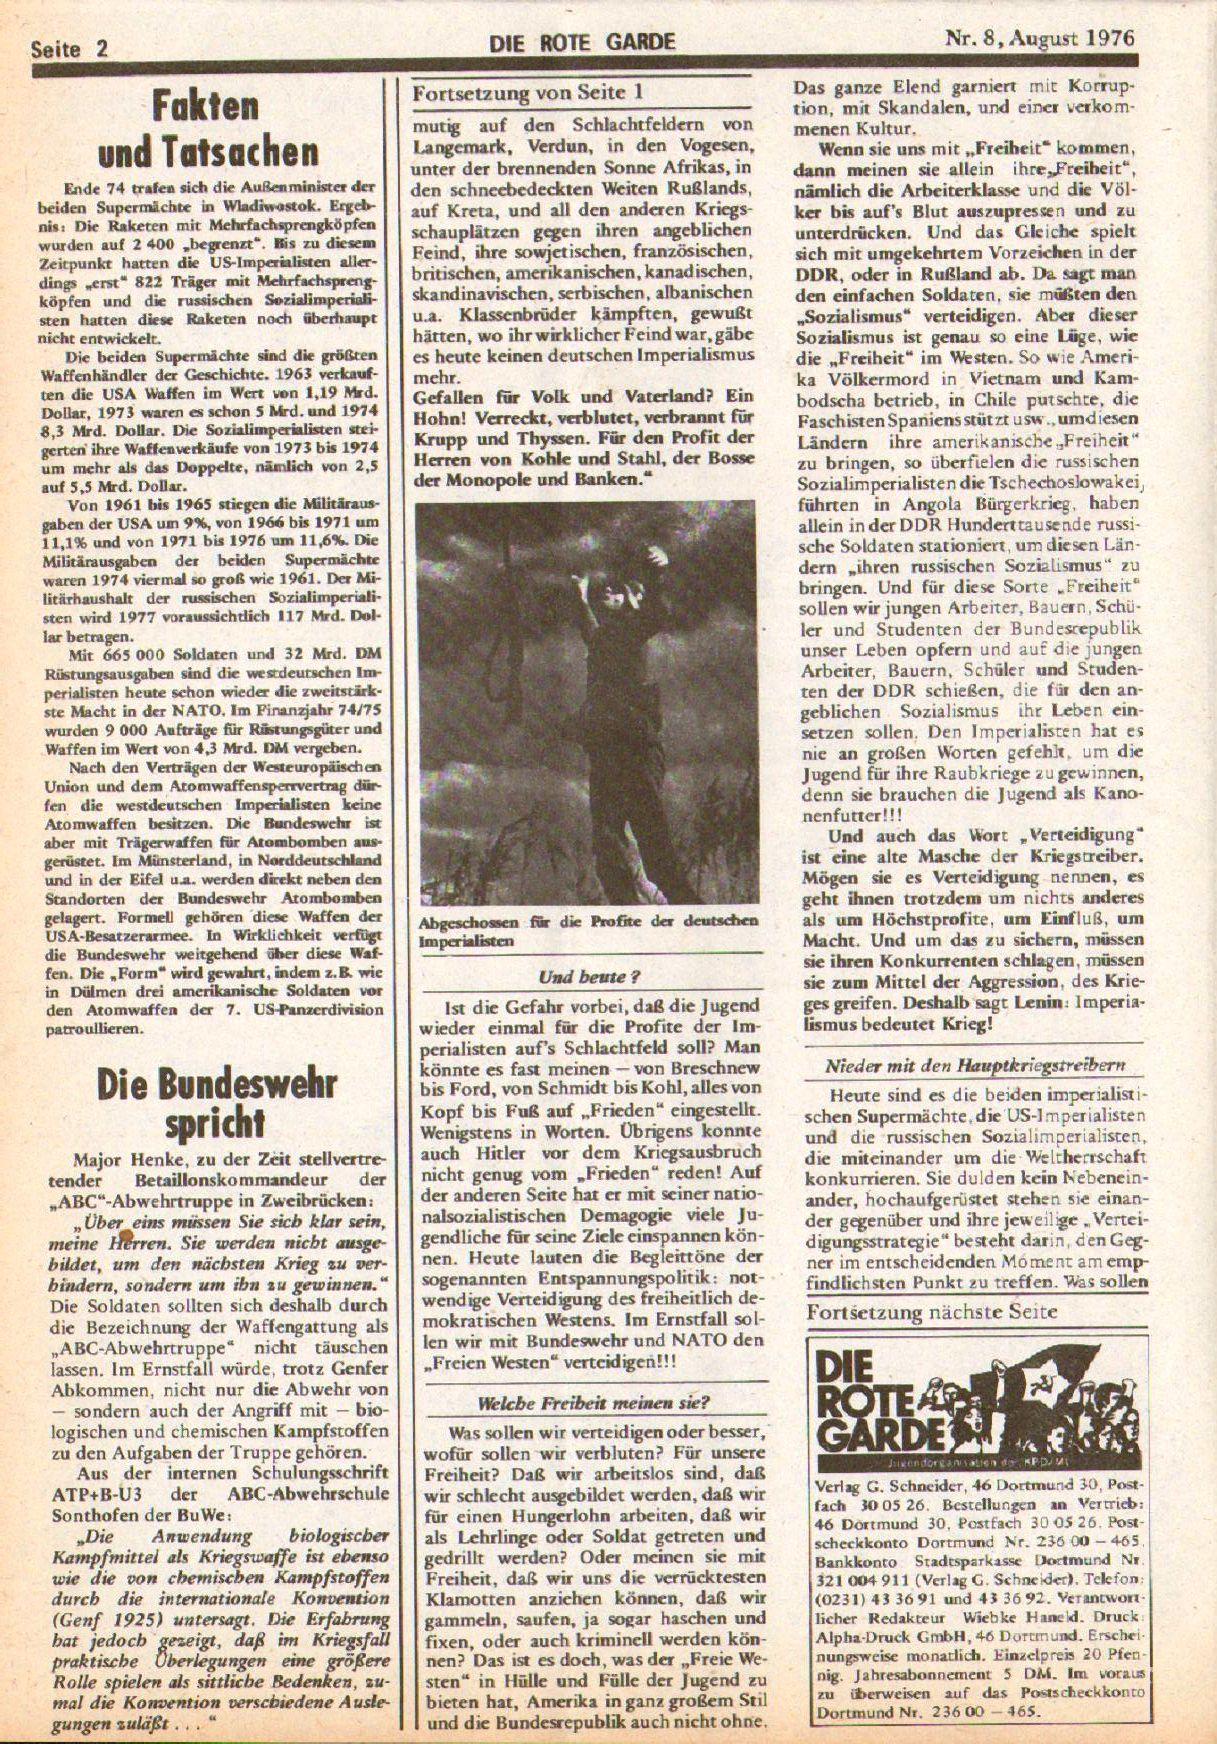 RGZ_1976_08_02